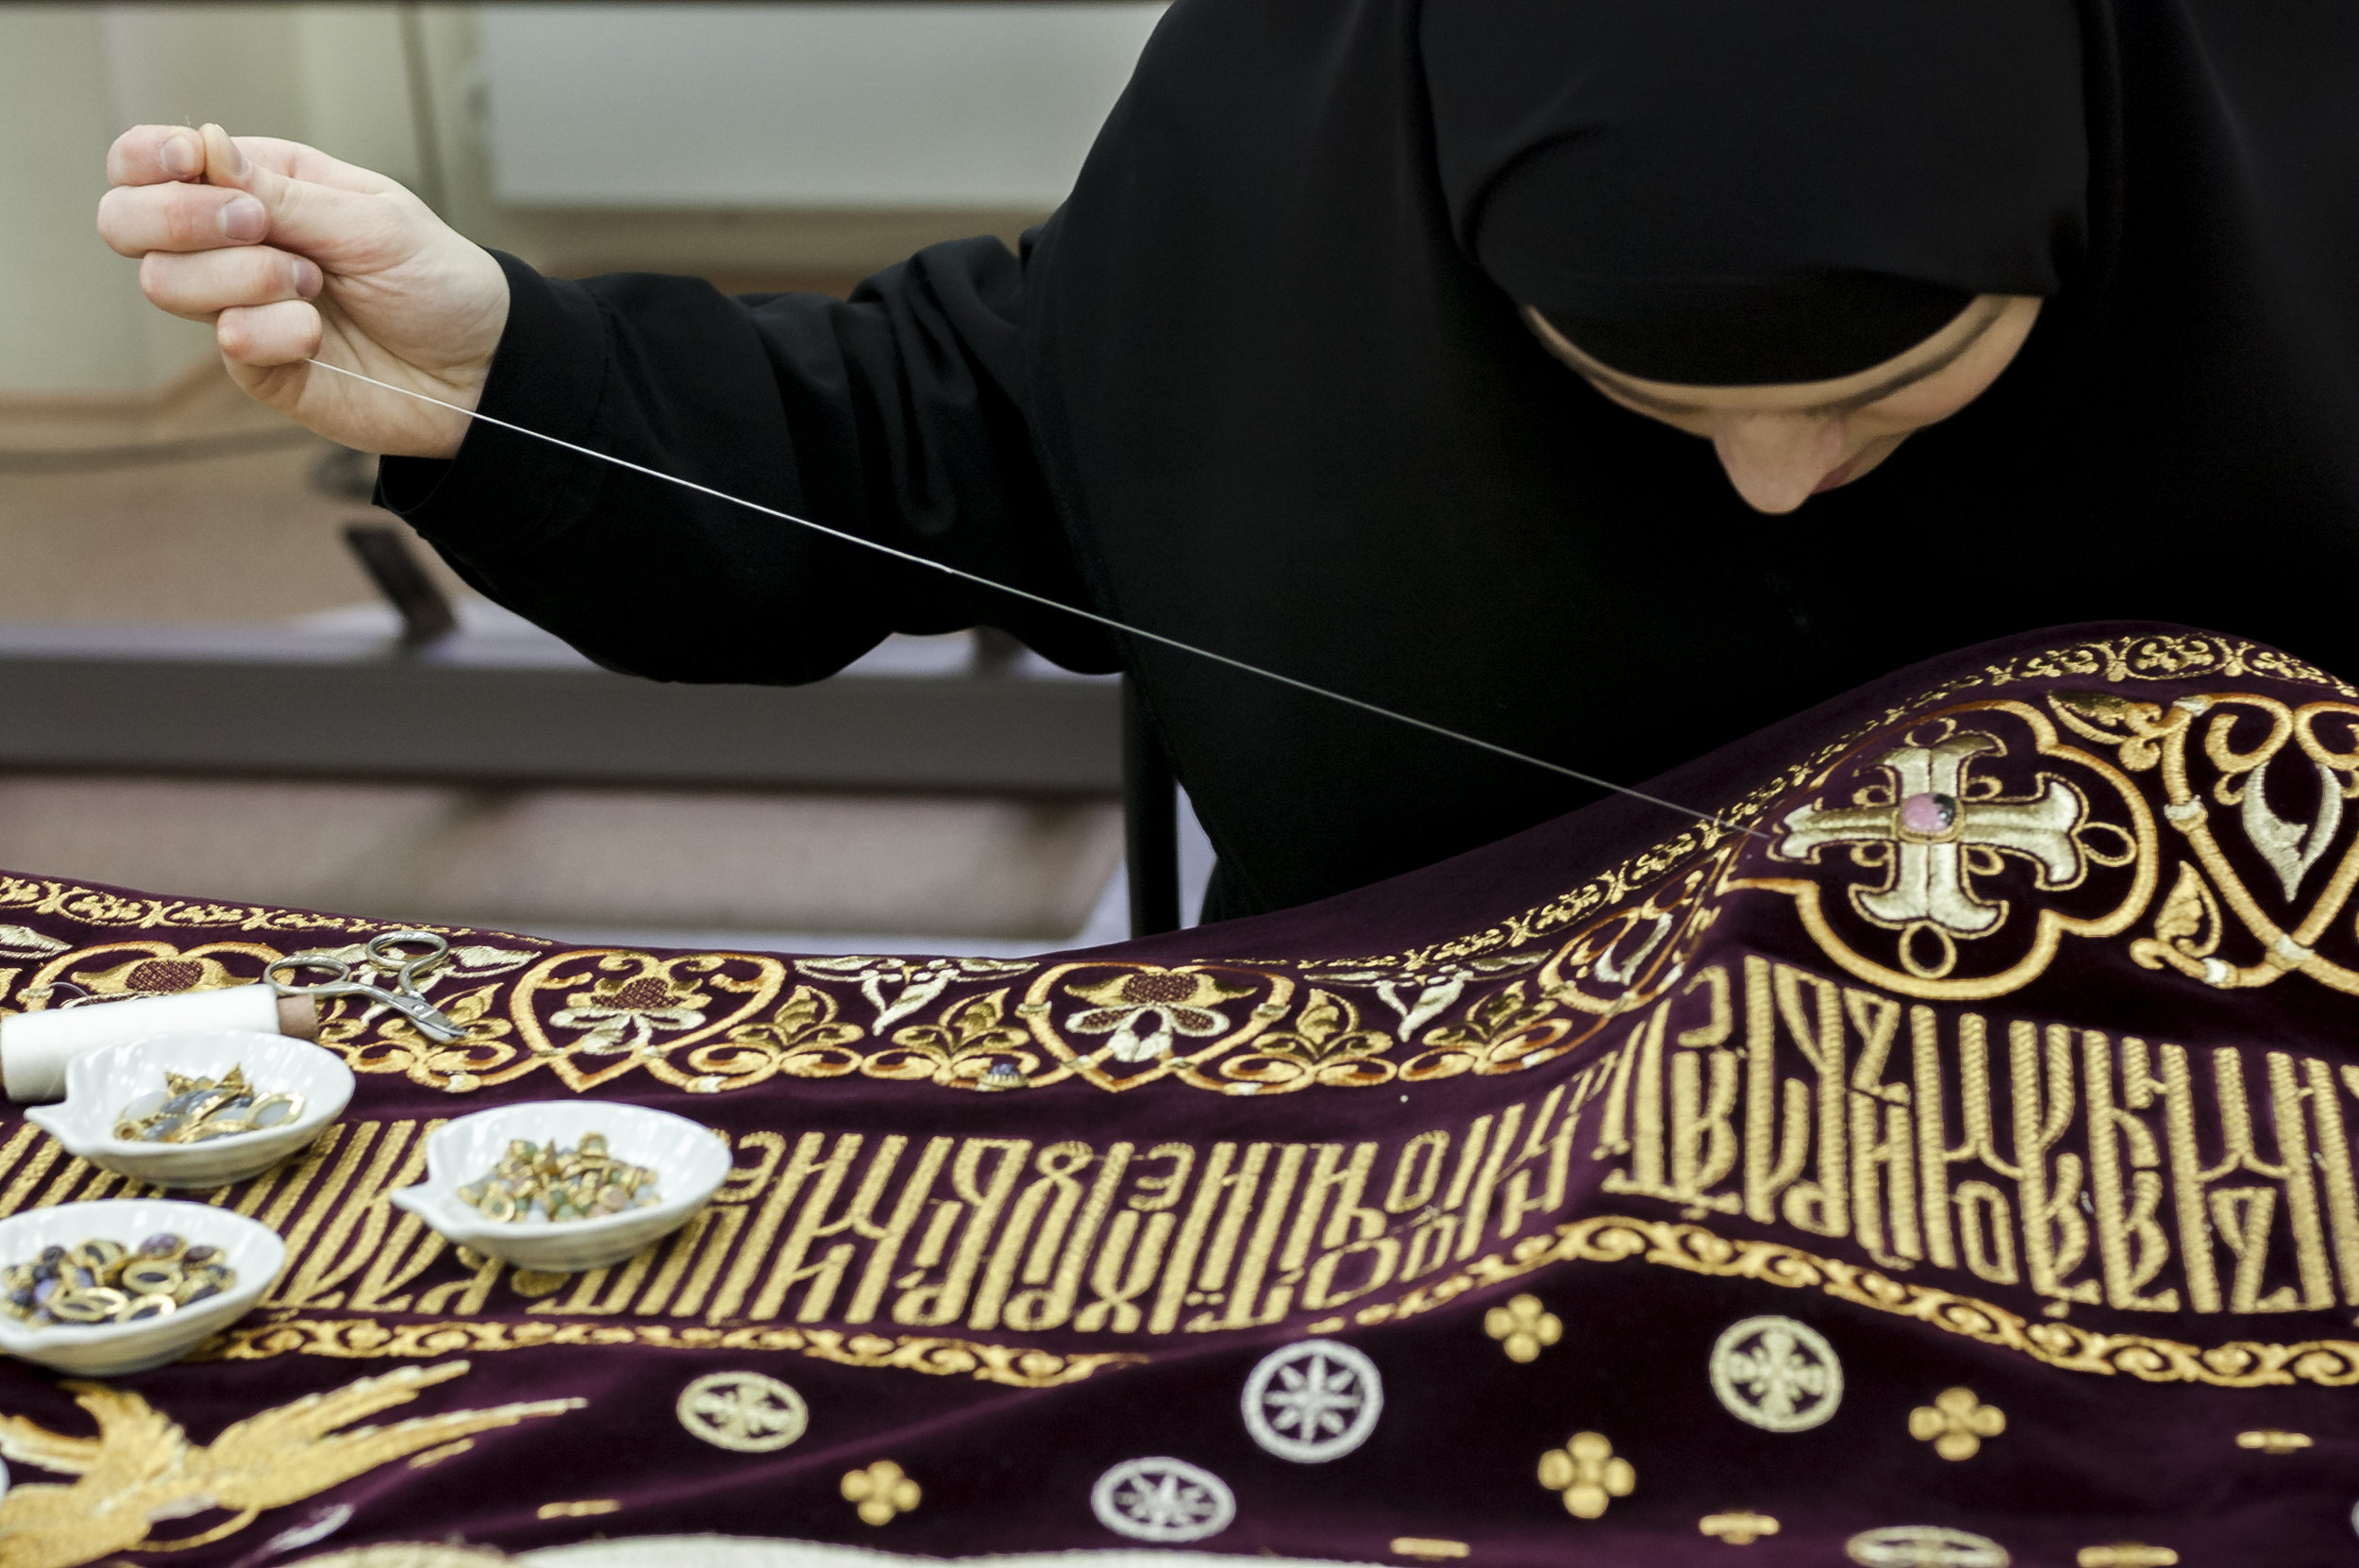 Nun sewing gems on liturgical cloth, Ekaterinburg, November 2009